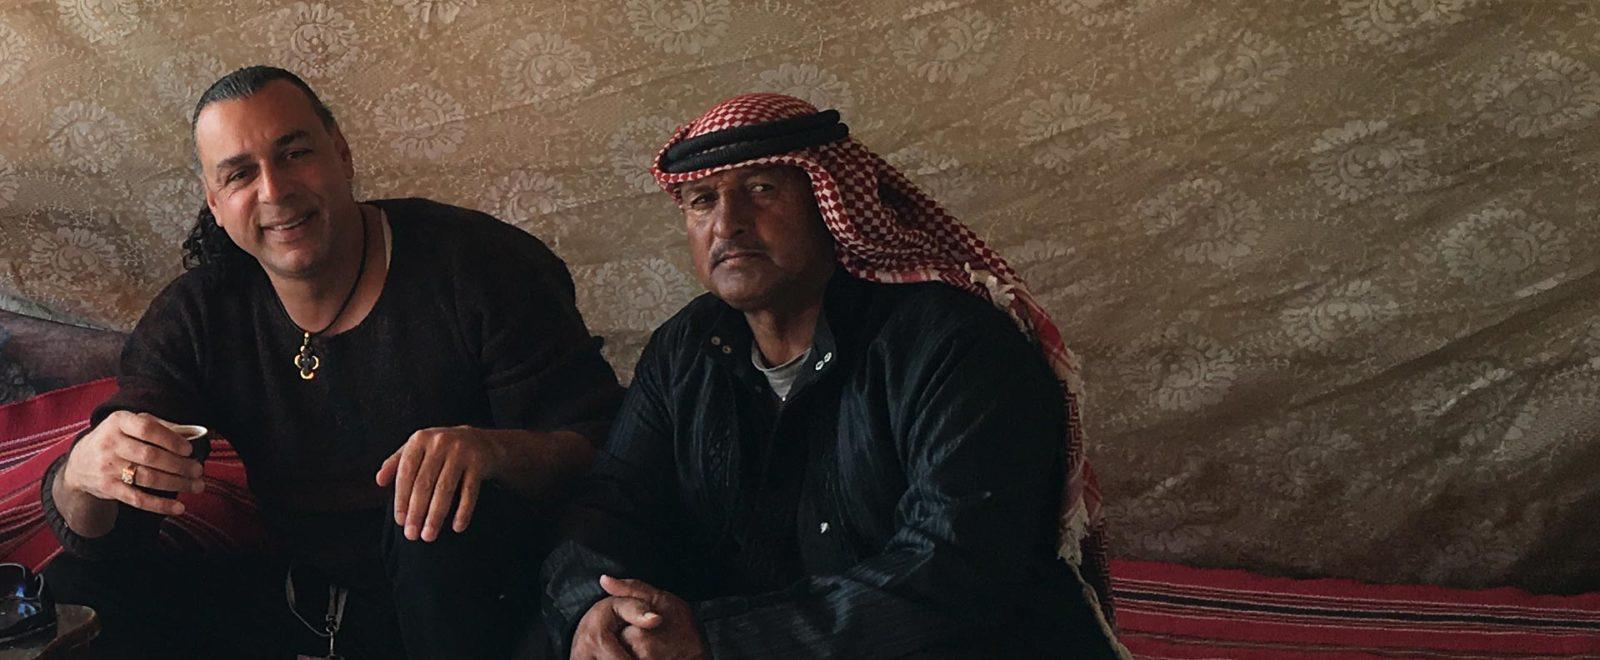 Bedouin Hospitality Experience